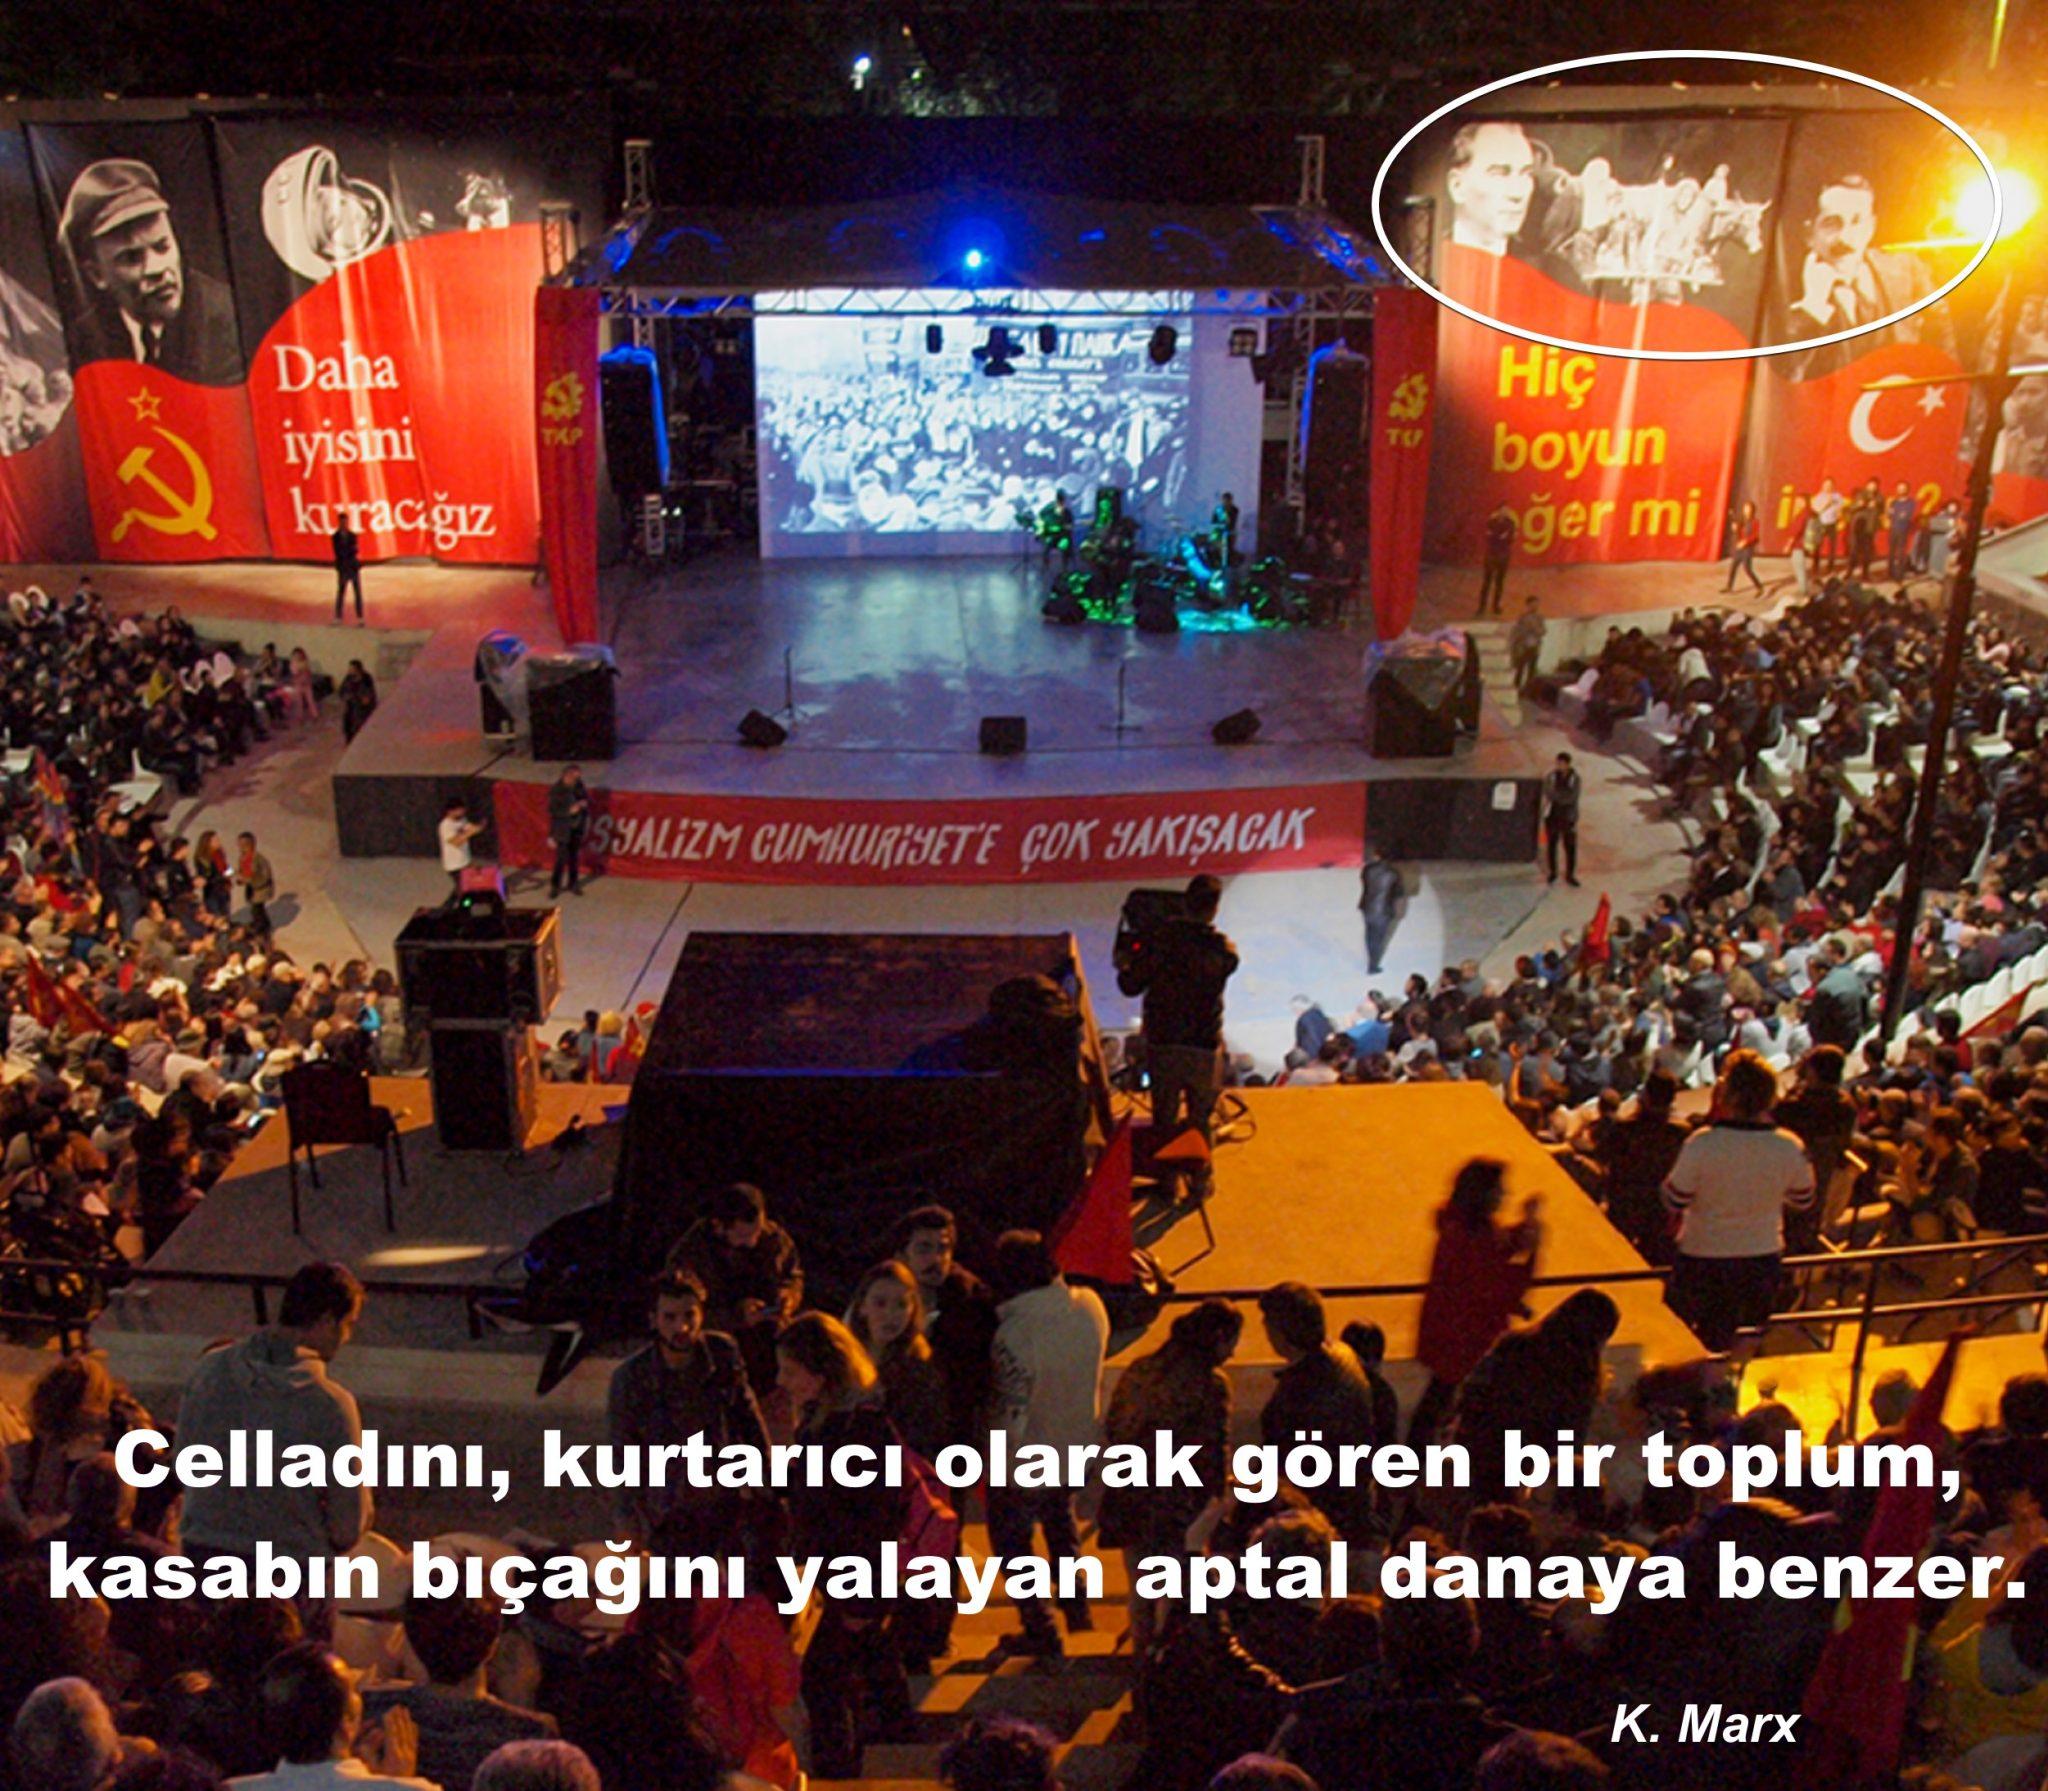 B11 Kemal Okuyan Türkiye Kemalist Partisi TKP